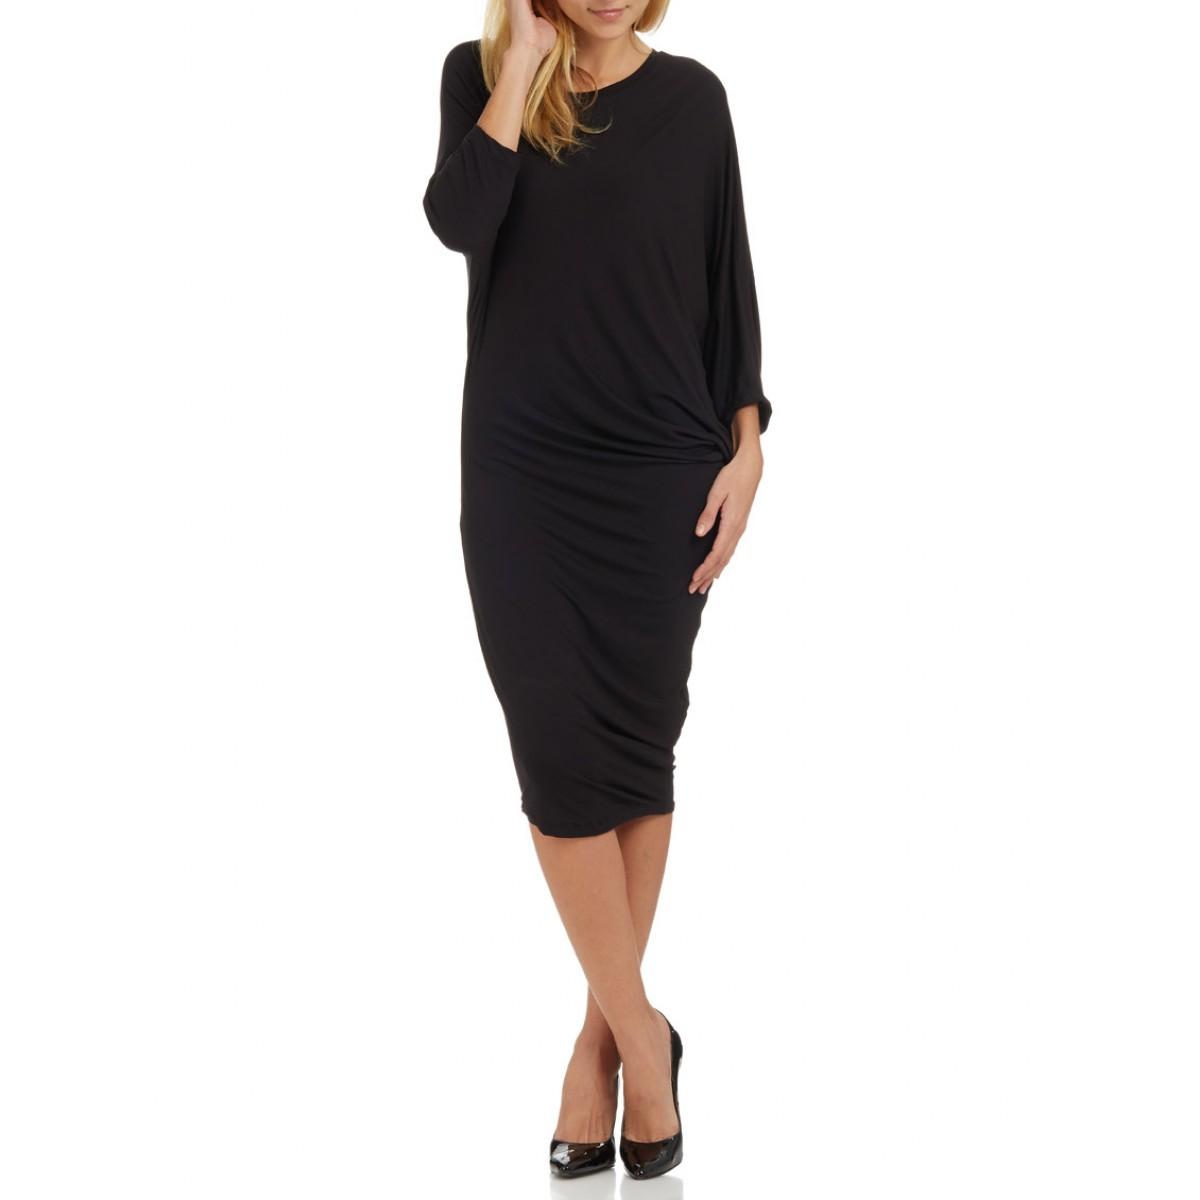 rabbiswife.com/blackdress/spree